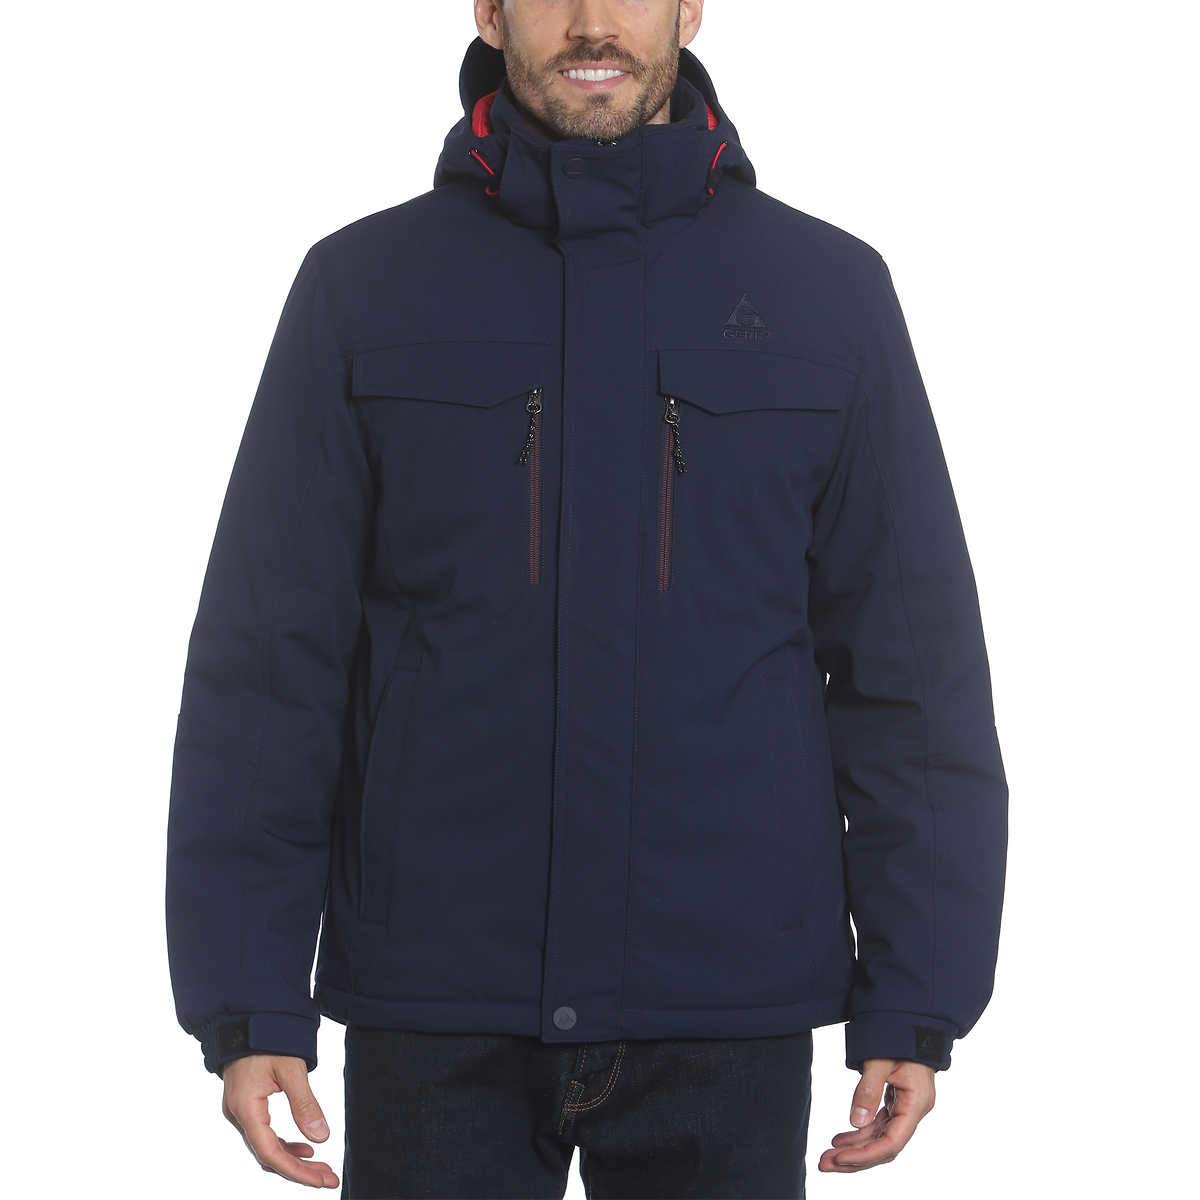 f7bf54d9 Amazon.com: Gerry Men's Nimbus Tech Jacket: Clothing